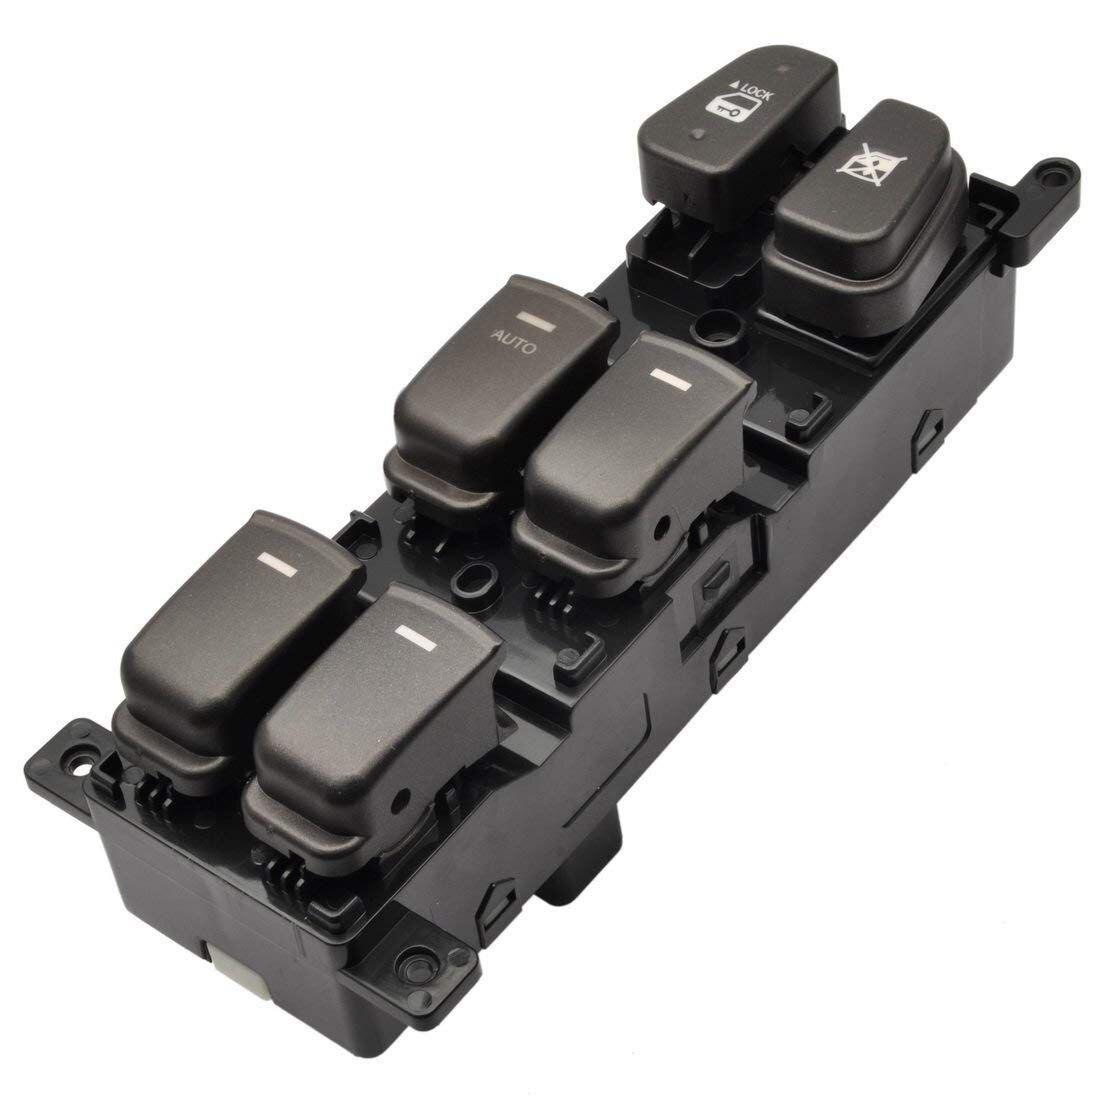 Master Power Window Switch Button Left Driver Side For Hyundai 08-10 Sonata 935703K600 93570-3K600